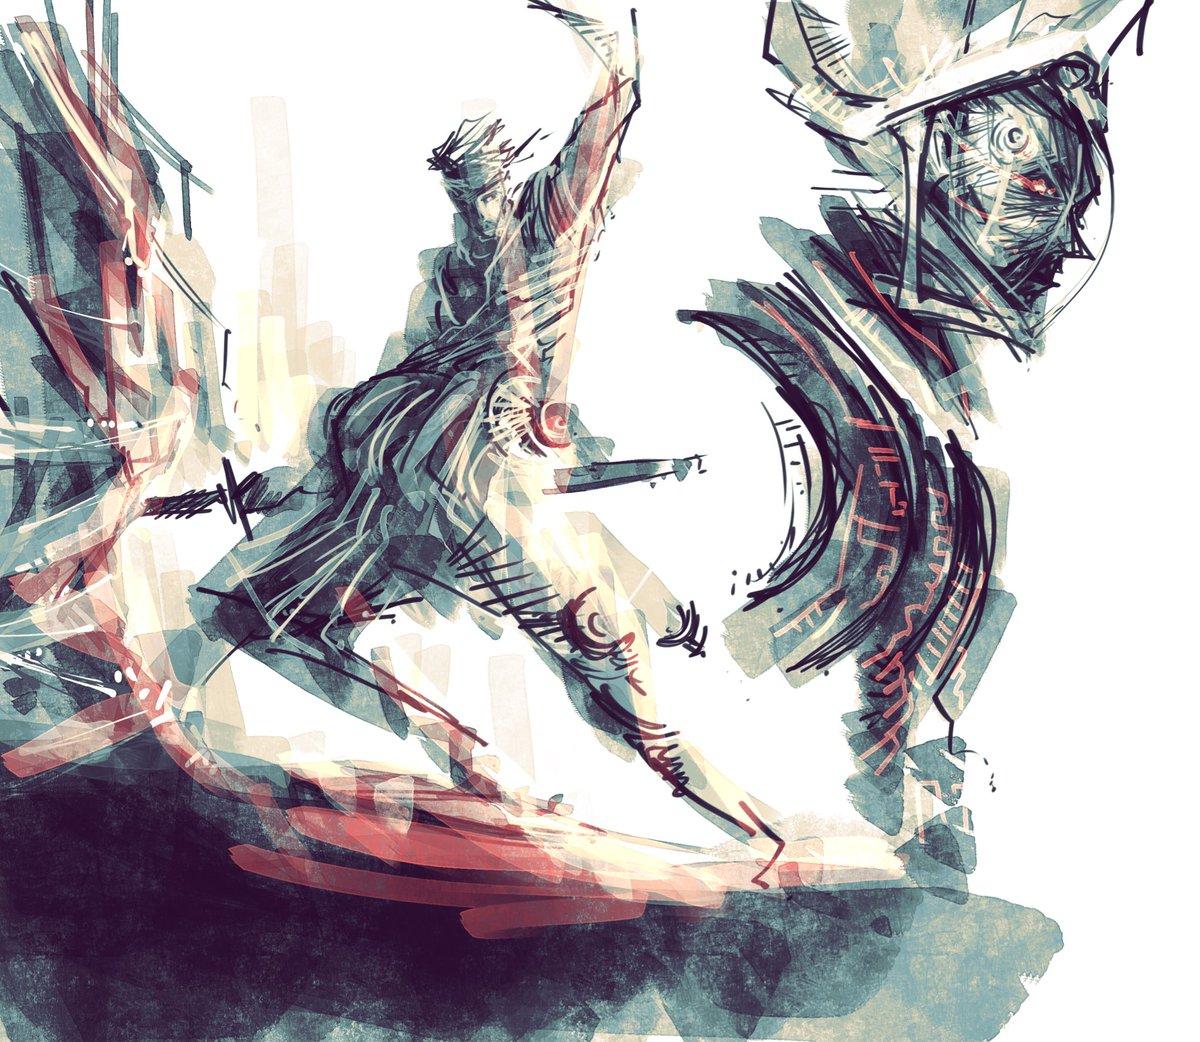 180925 revolution  #clipstudiopaint #manga #漫画 #art #illustration #comic  #drawing  #イラスト #マンガ #hrfm78 #Wacom #cintiq #sciencefiction<br>http://pic.twitter.com/pGD7ZO5axM